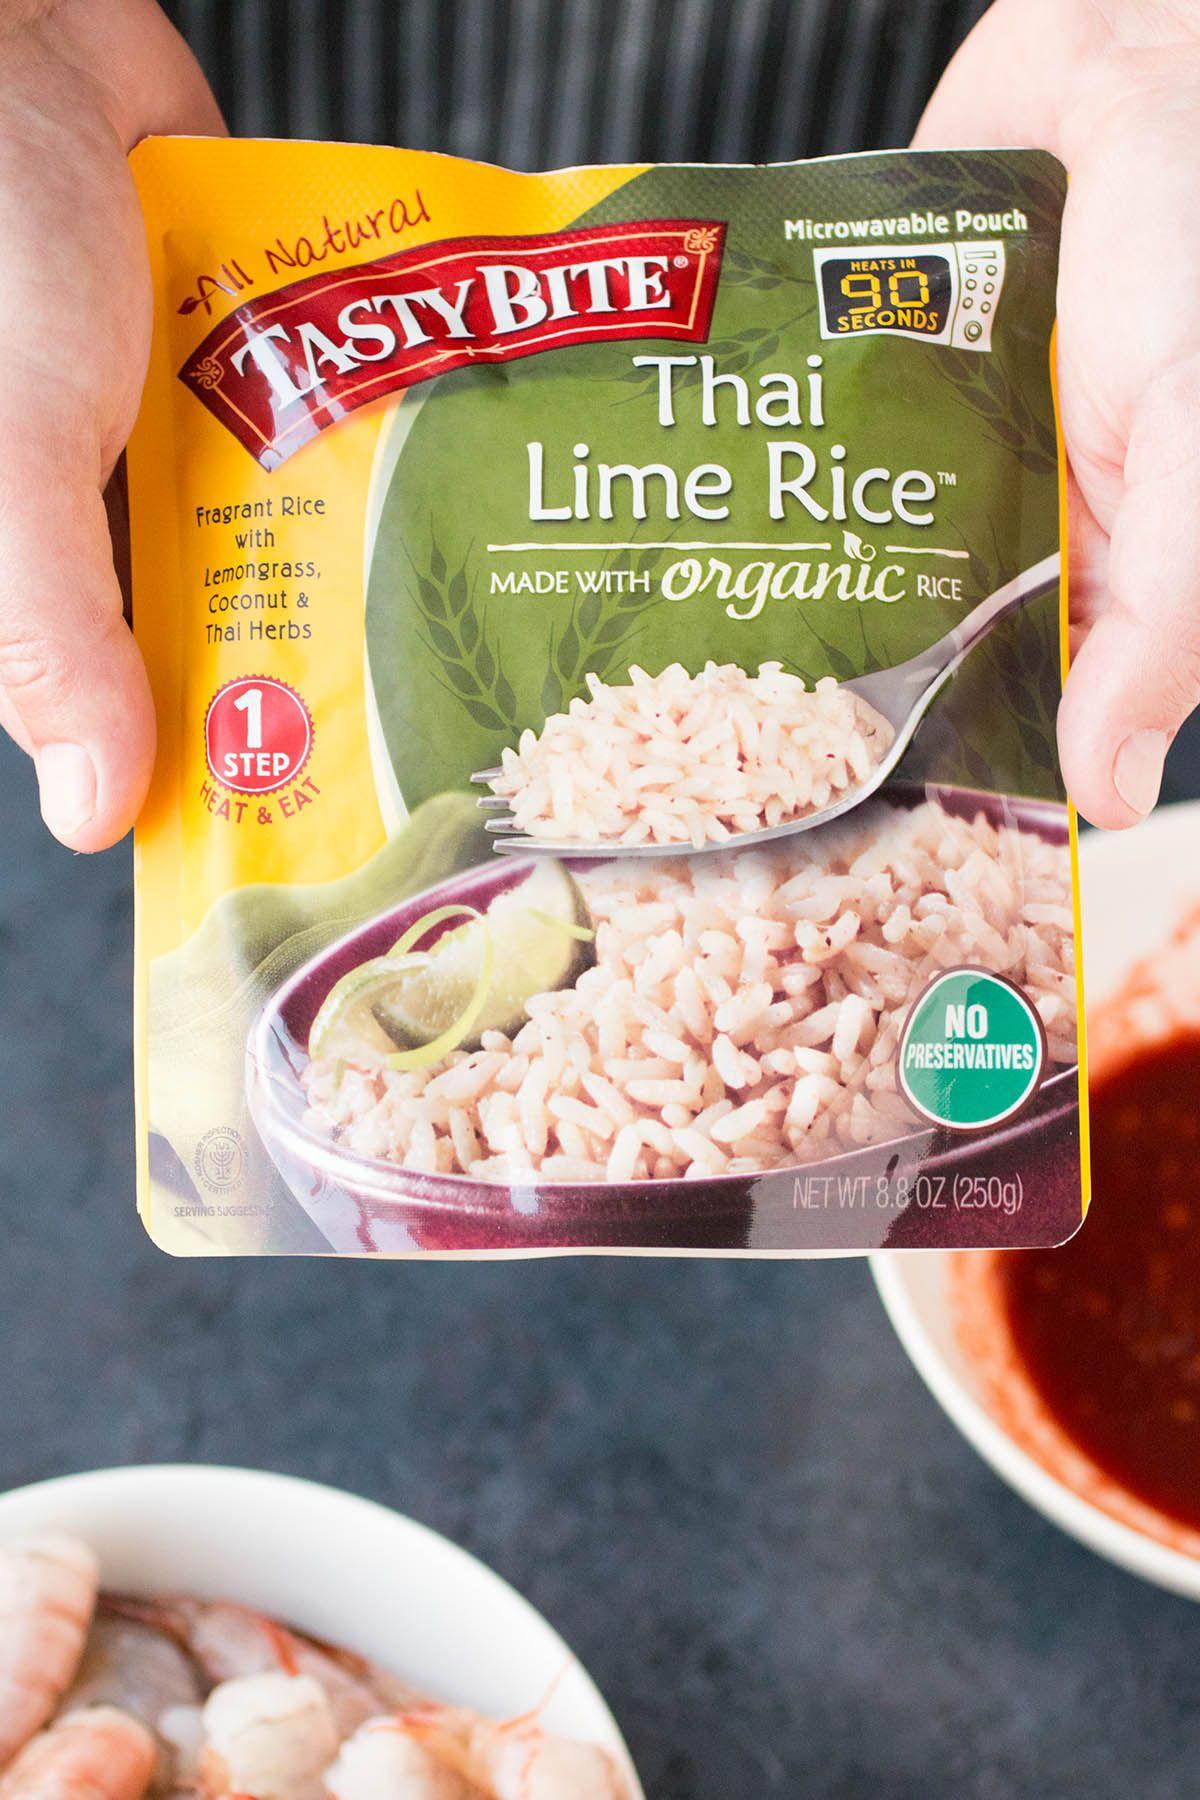 Chili-Garlic Shrimp with Thai Lime Rice